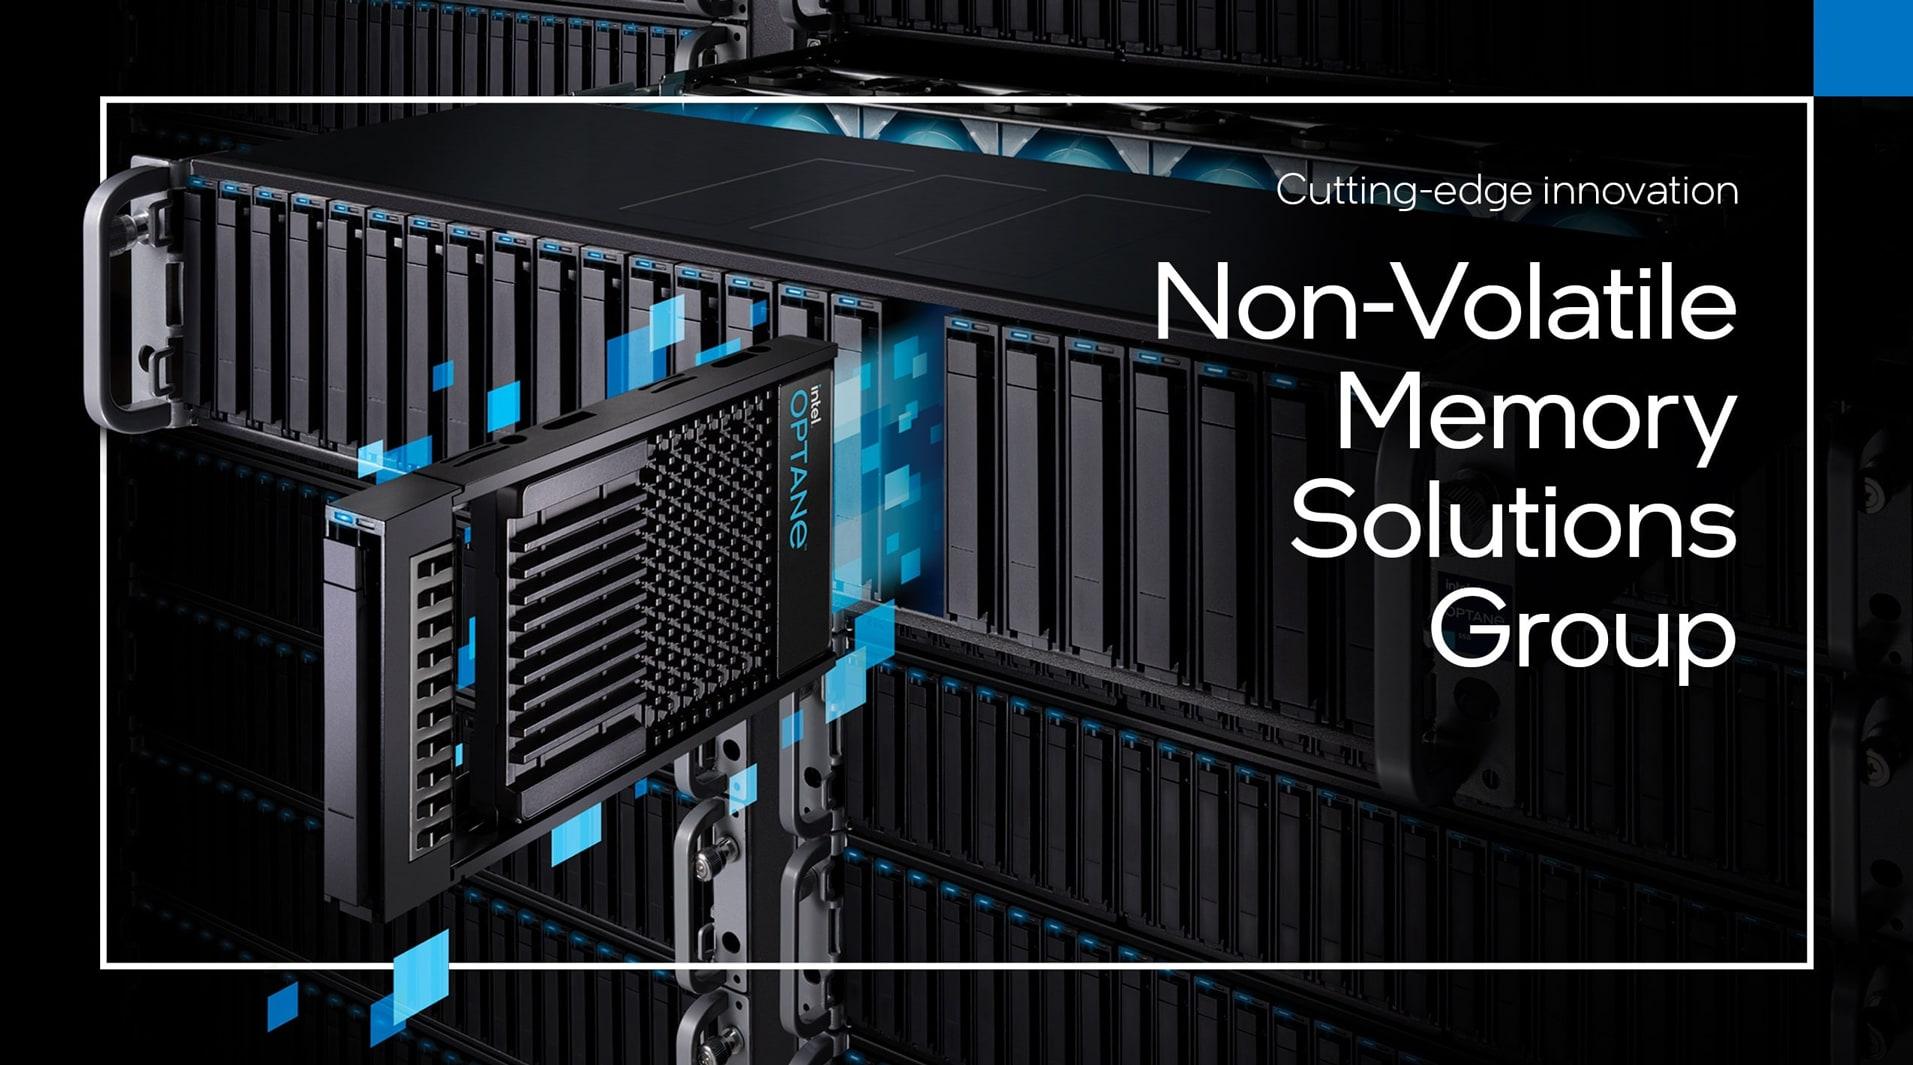 Non-Volatile Memory Solutions Group